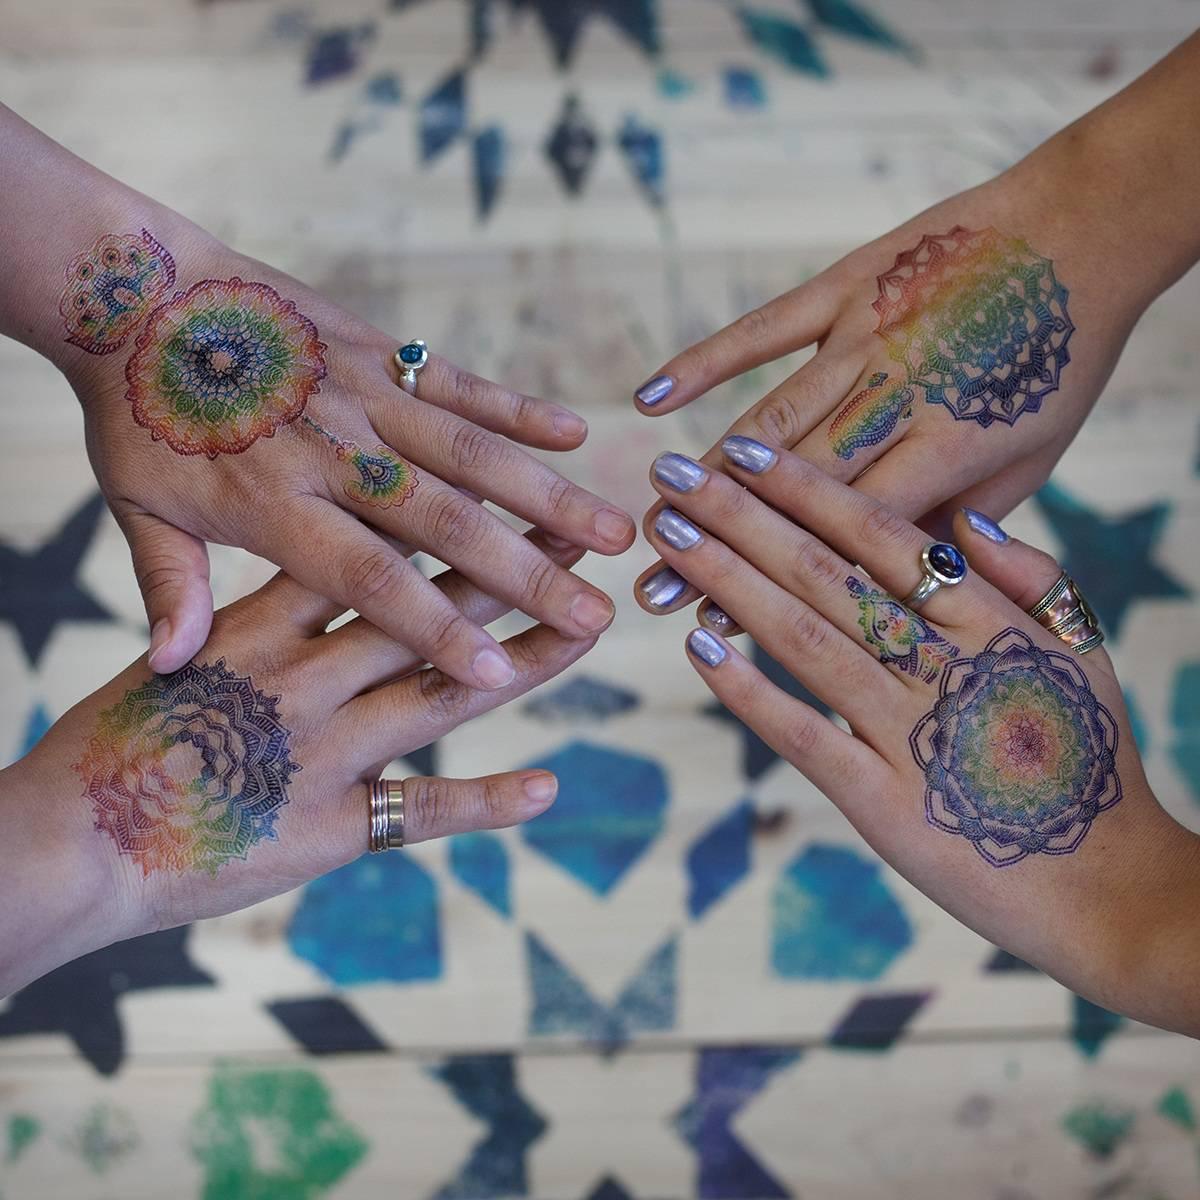 tattoo on hands